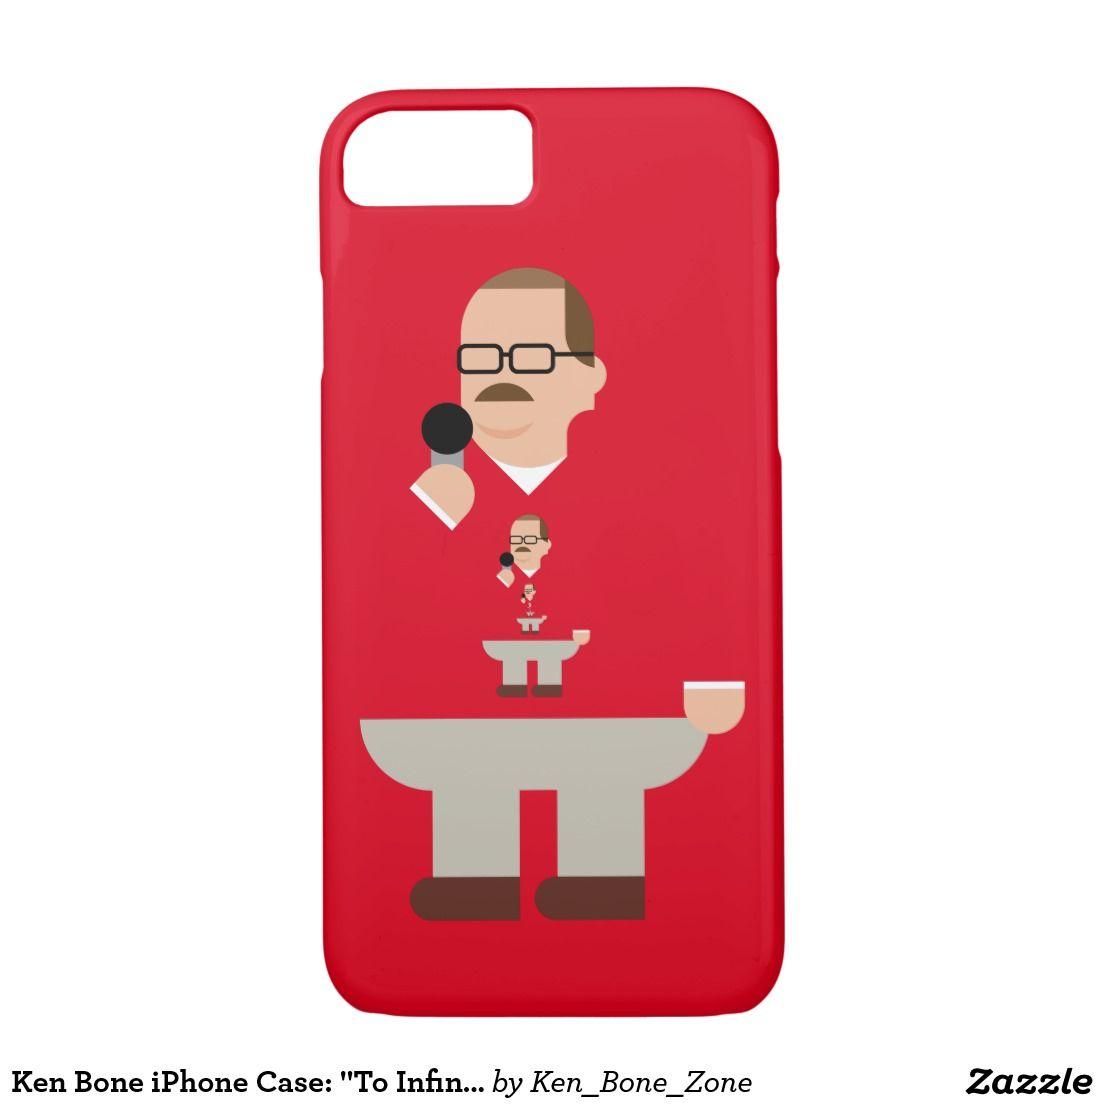 "Ken Bone iPhone Case: ""To Infinity and BONE"" LOL"